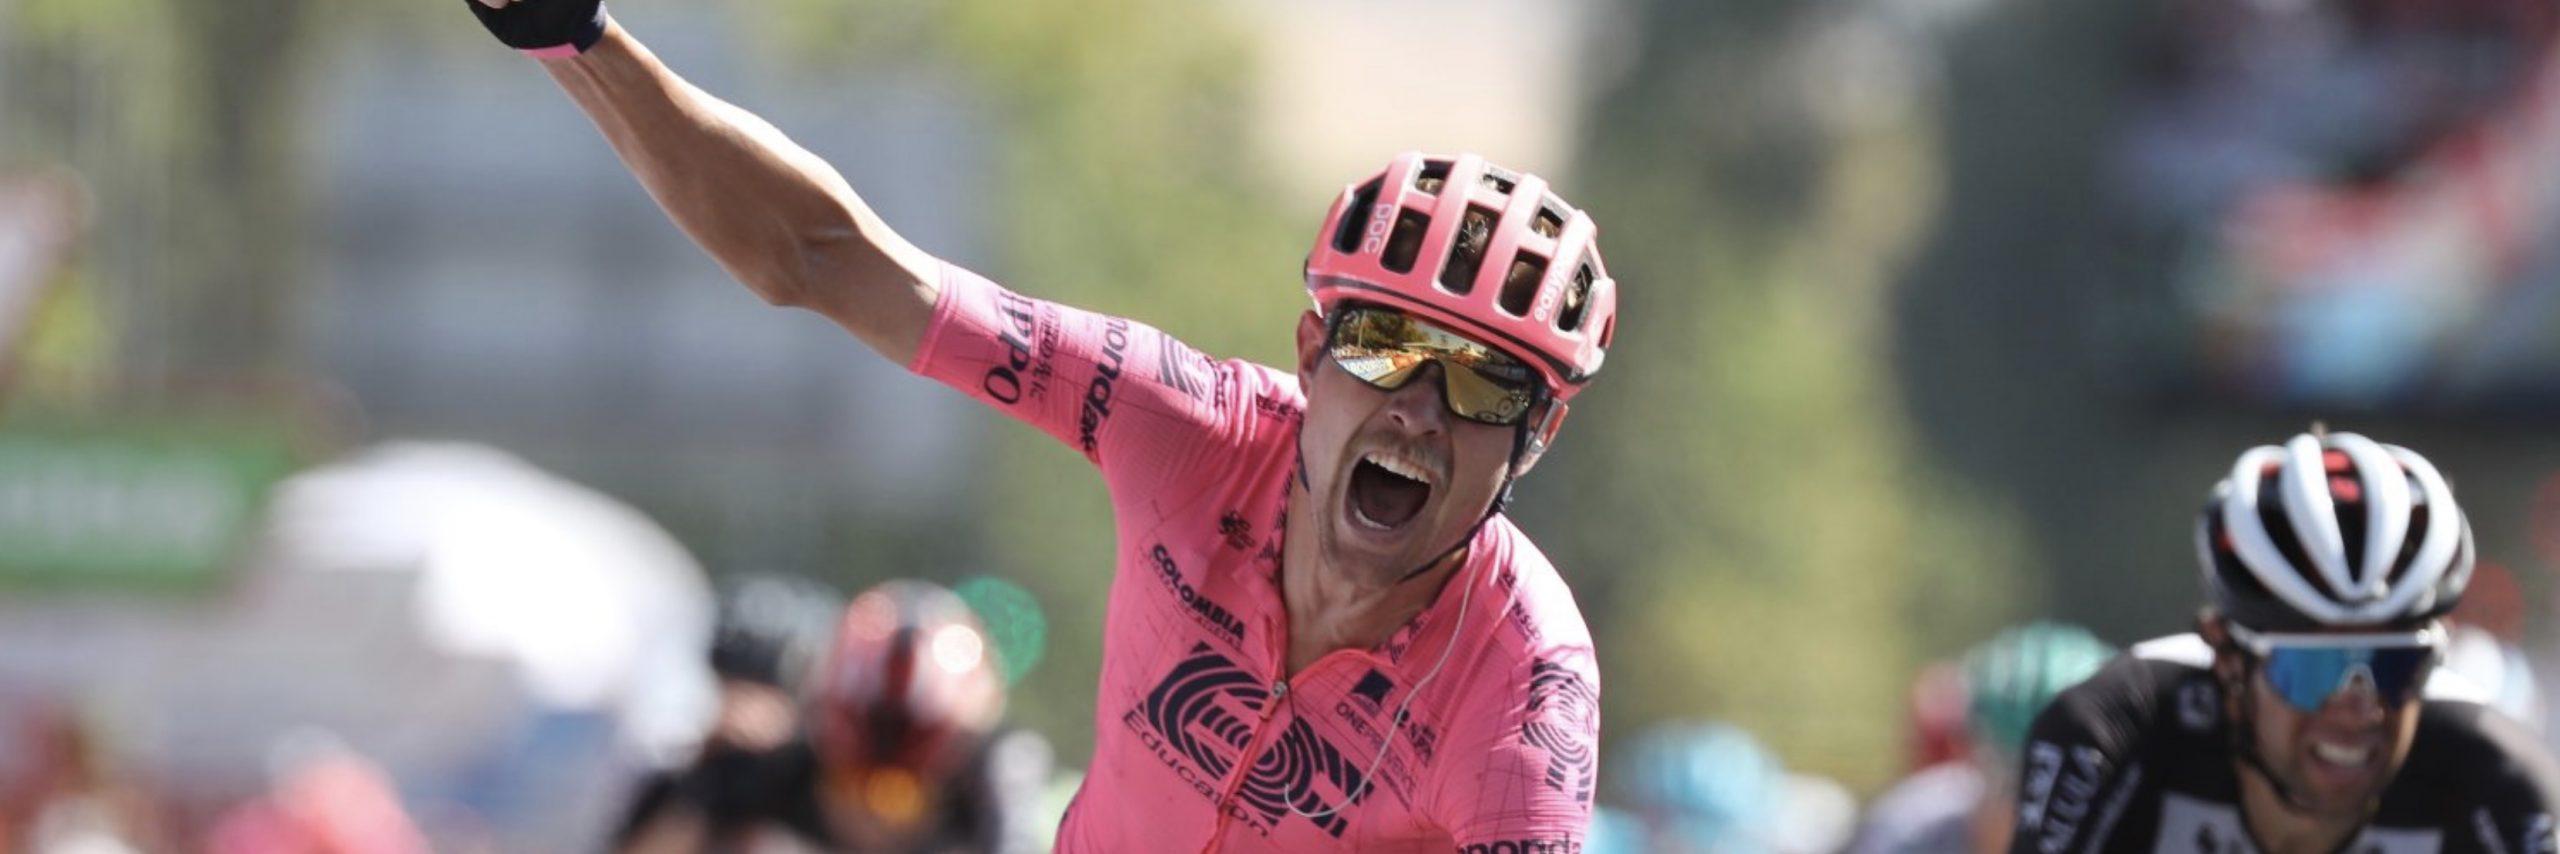 Vuelta 2021: Cort Nielsen ha vinto la 12^ tappa